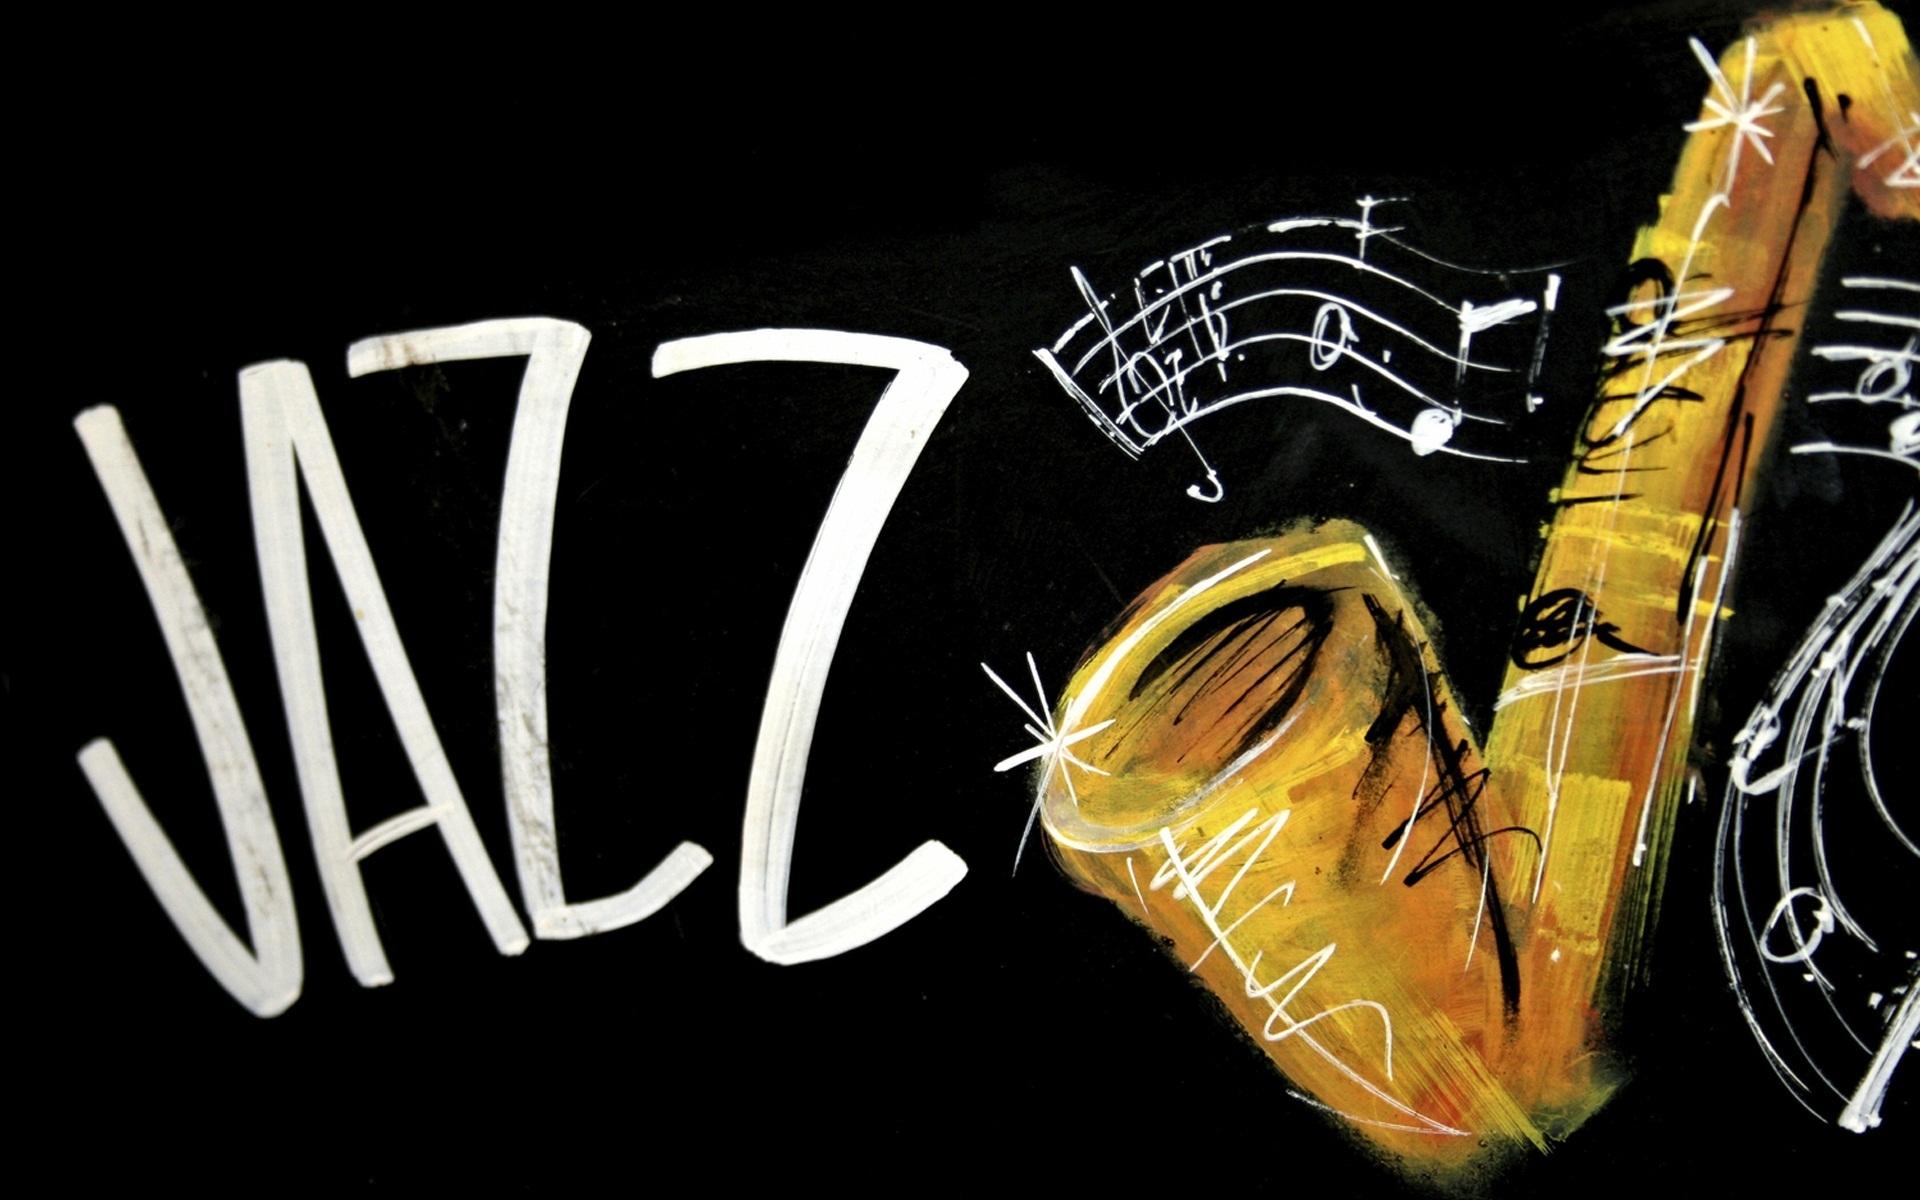 Journée internationale du Jazz : le joli poème d'Irina Bokova